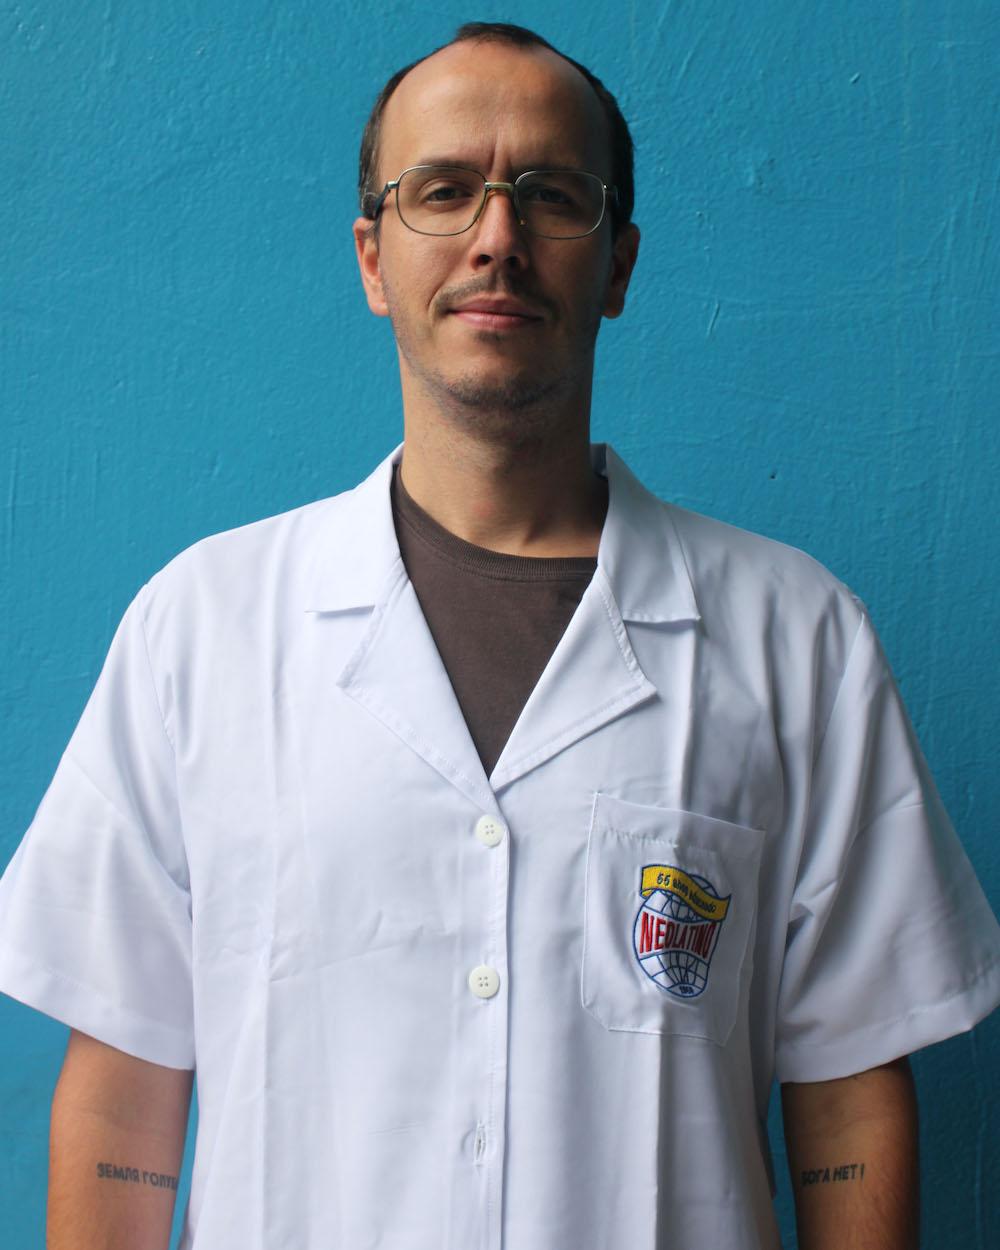 Prof. TOM